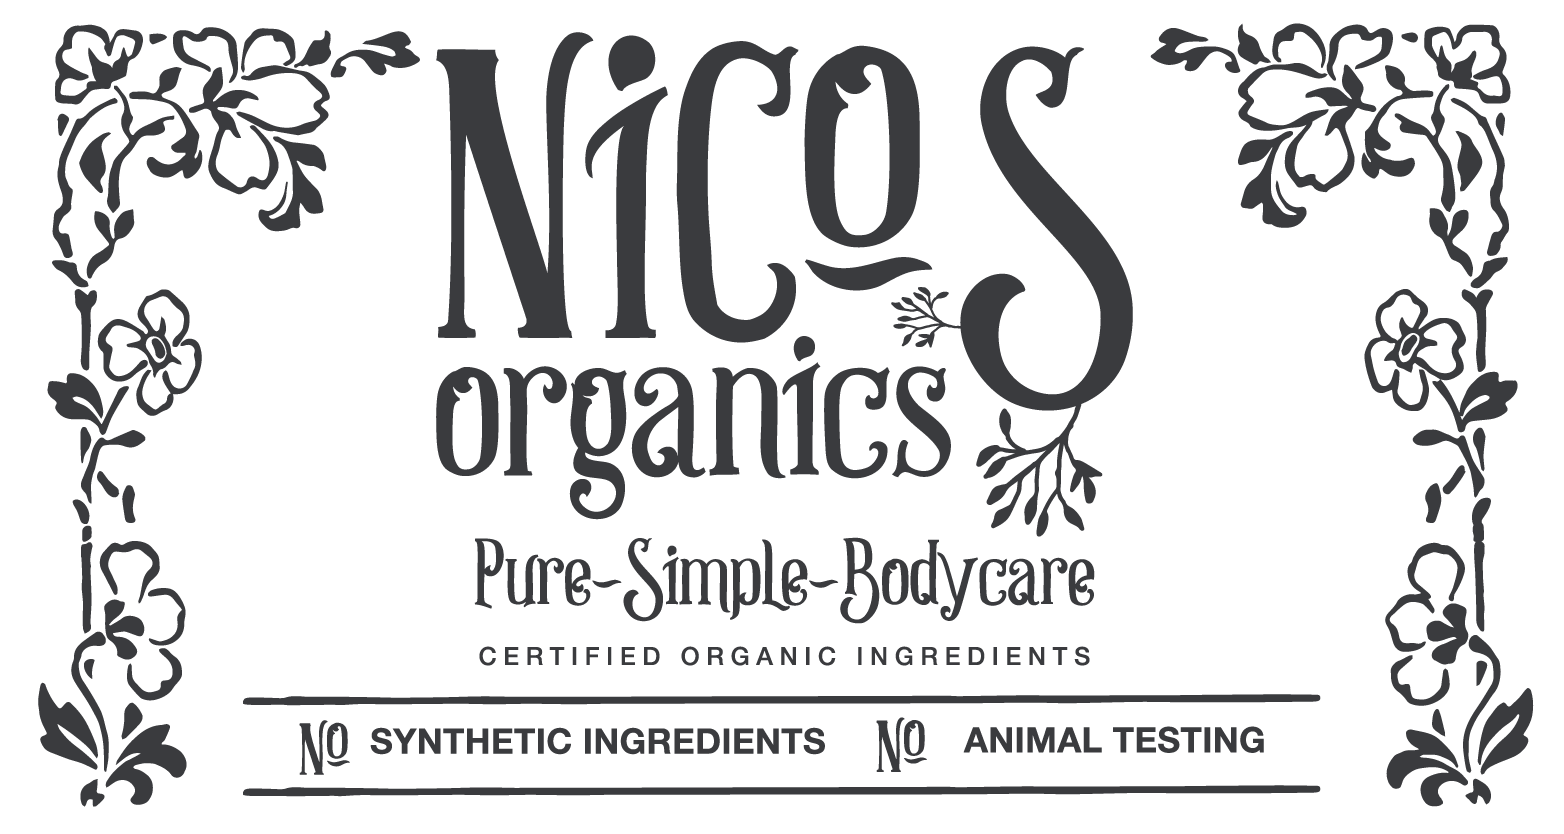 Nicos Organics Coupons and Promo Code